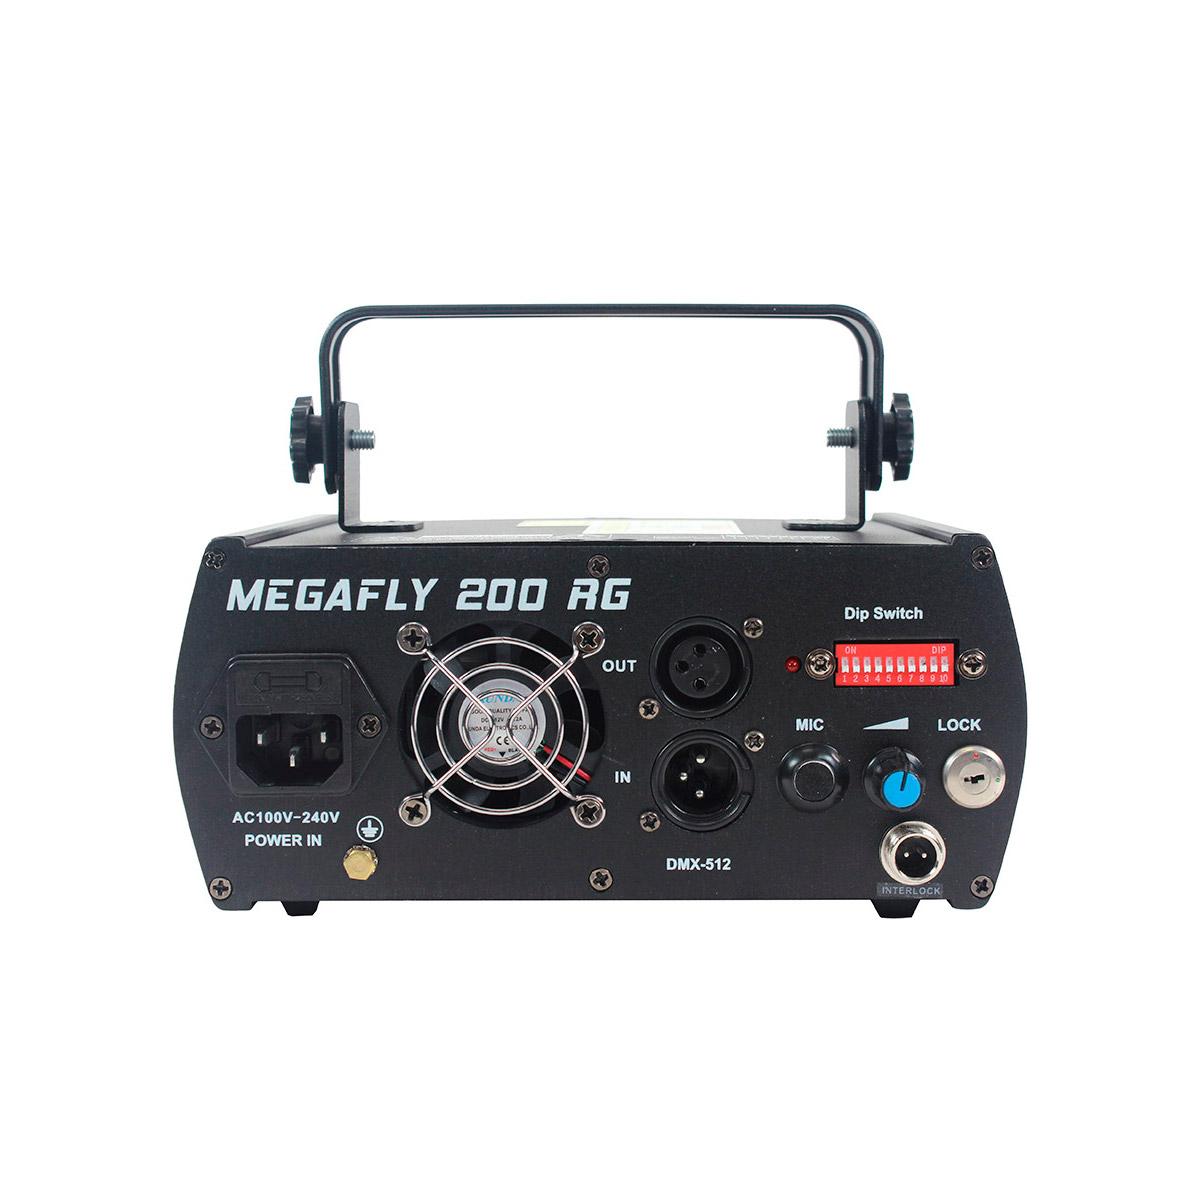 MEGAFLY 200 RG